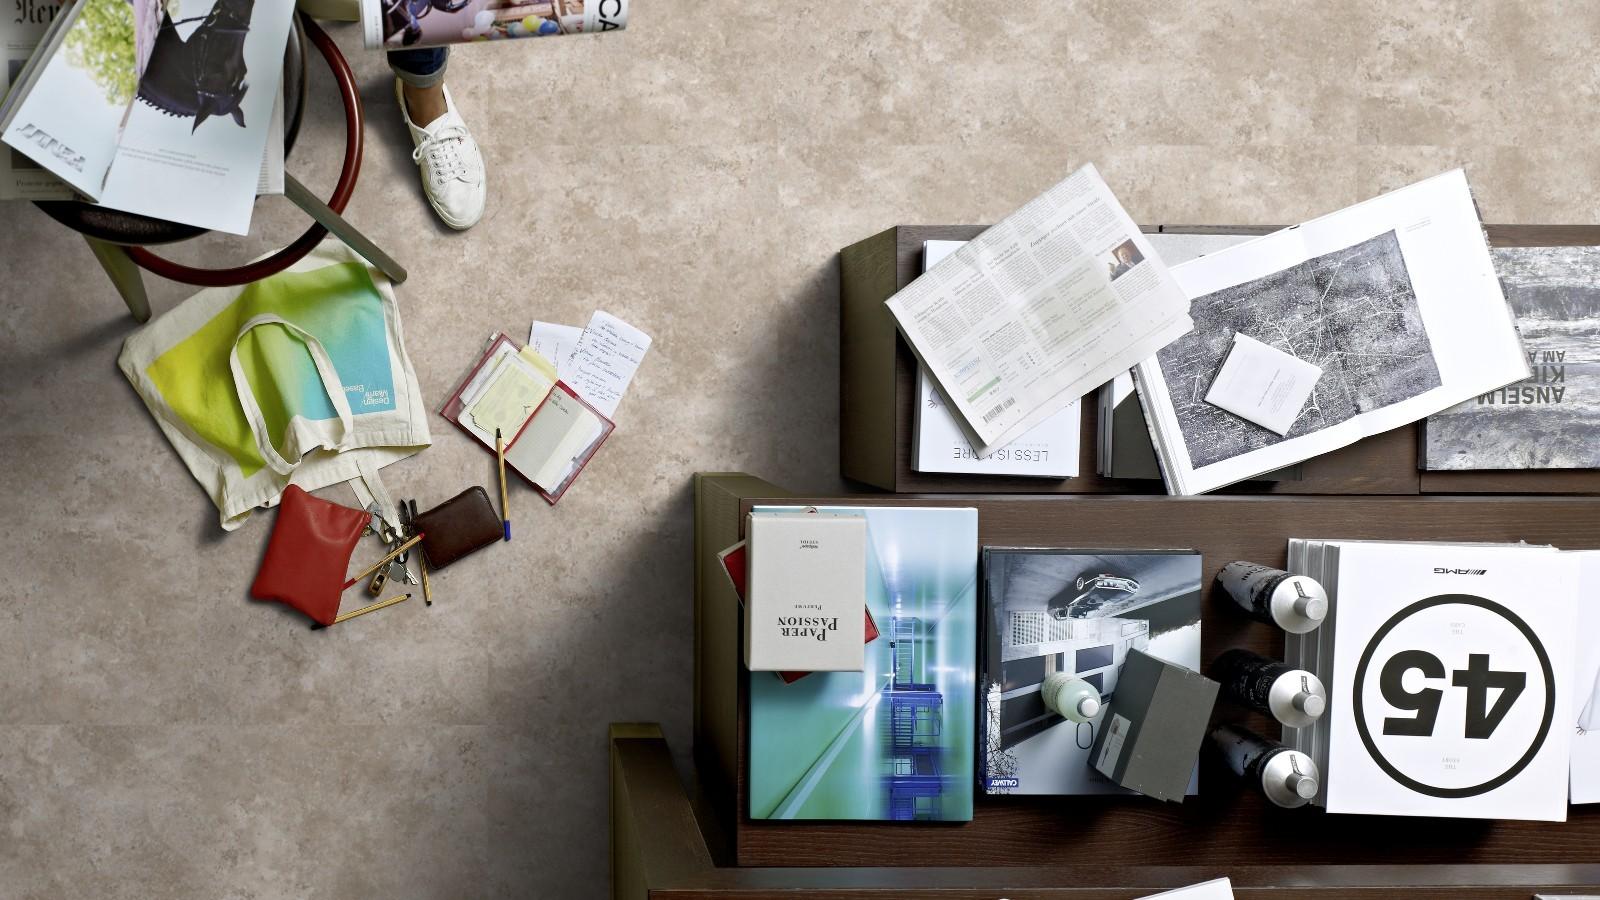 rinnert raumausstattung parkett das renovierungsteam. Black Bedroom Furniture Sets. Home Design Ideas